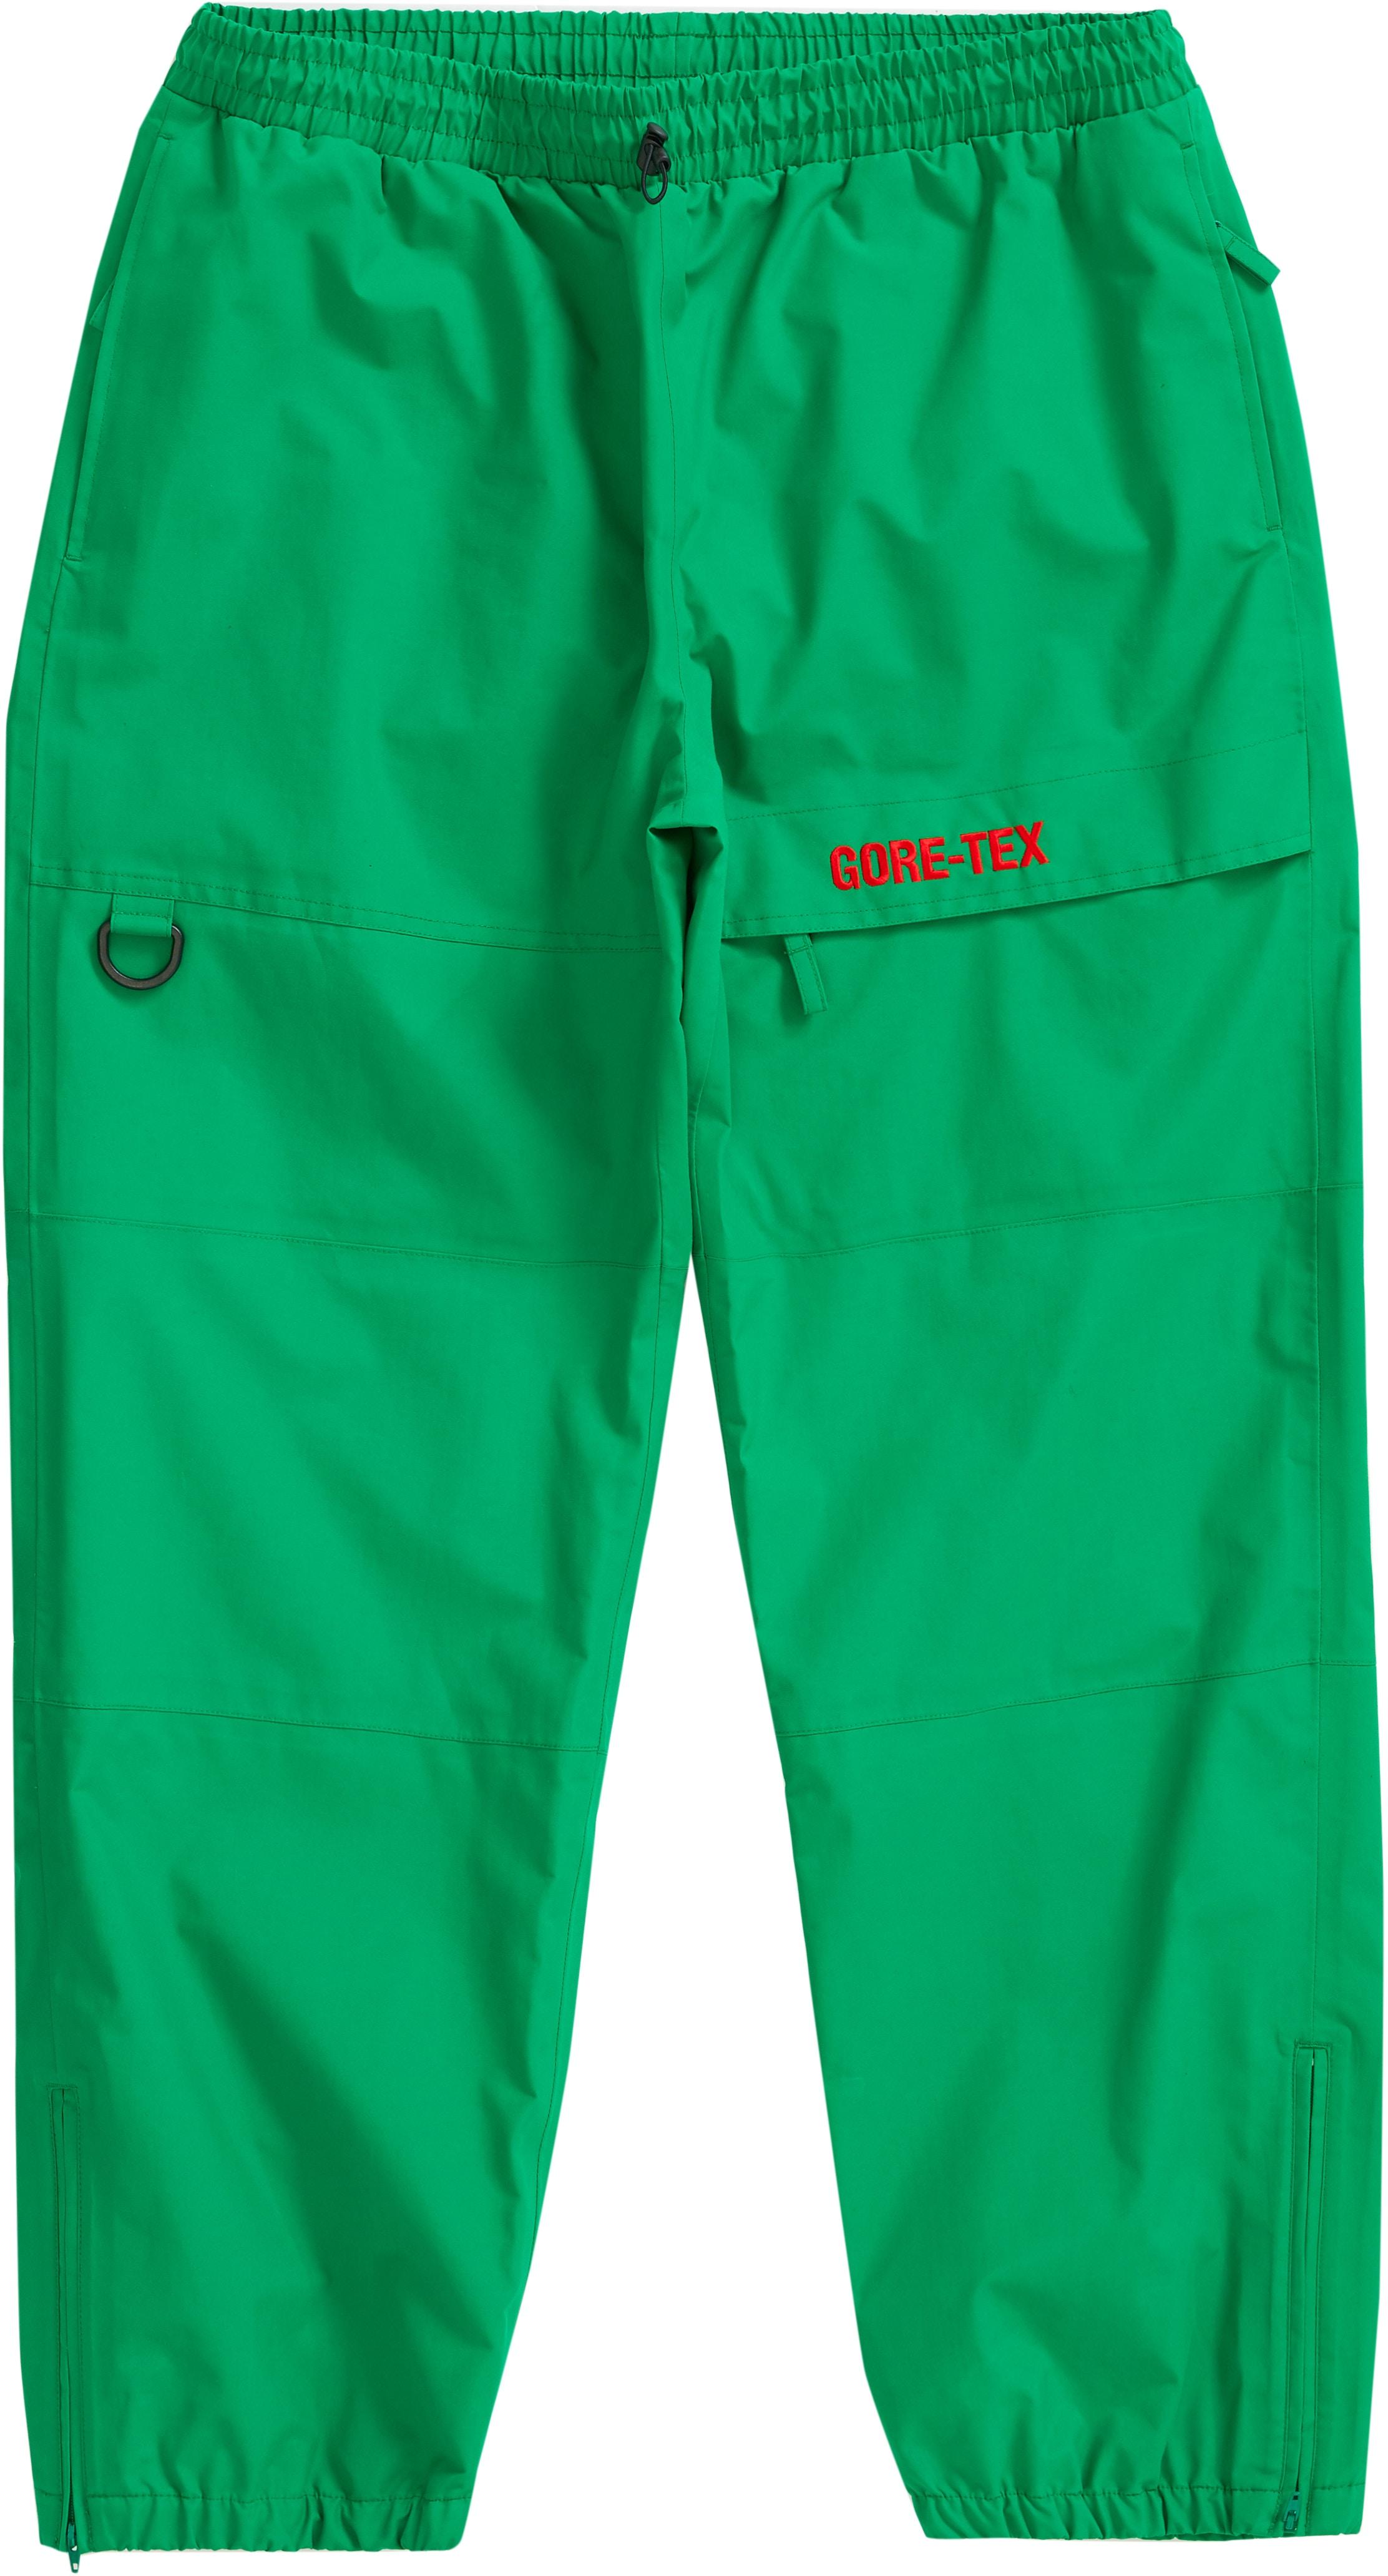 Supreme Gore Tex Pant Ss20 Green